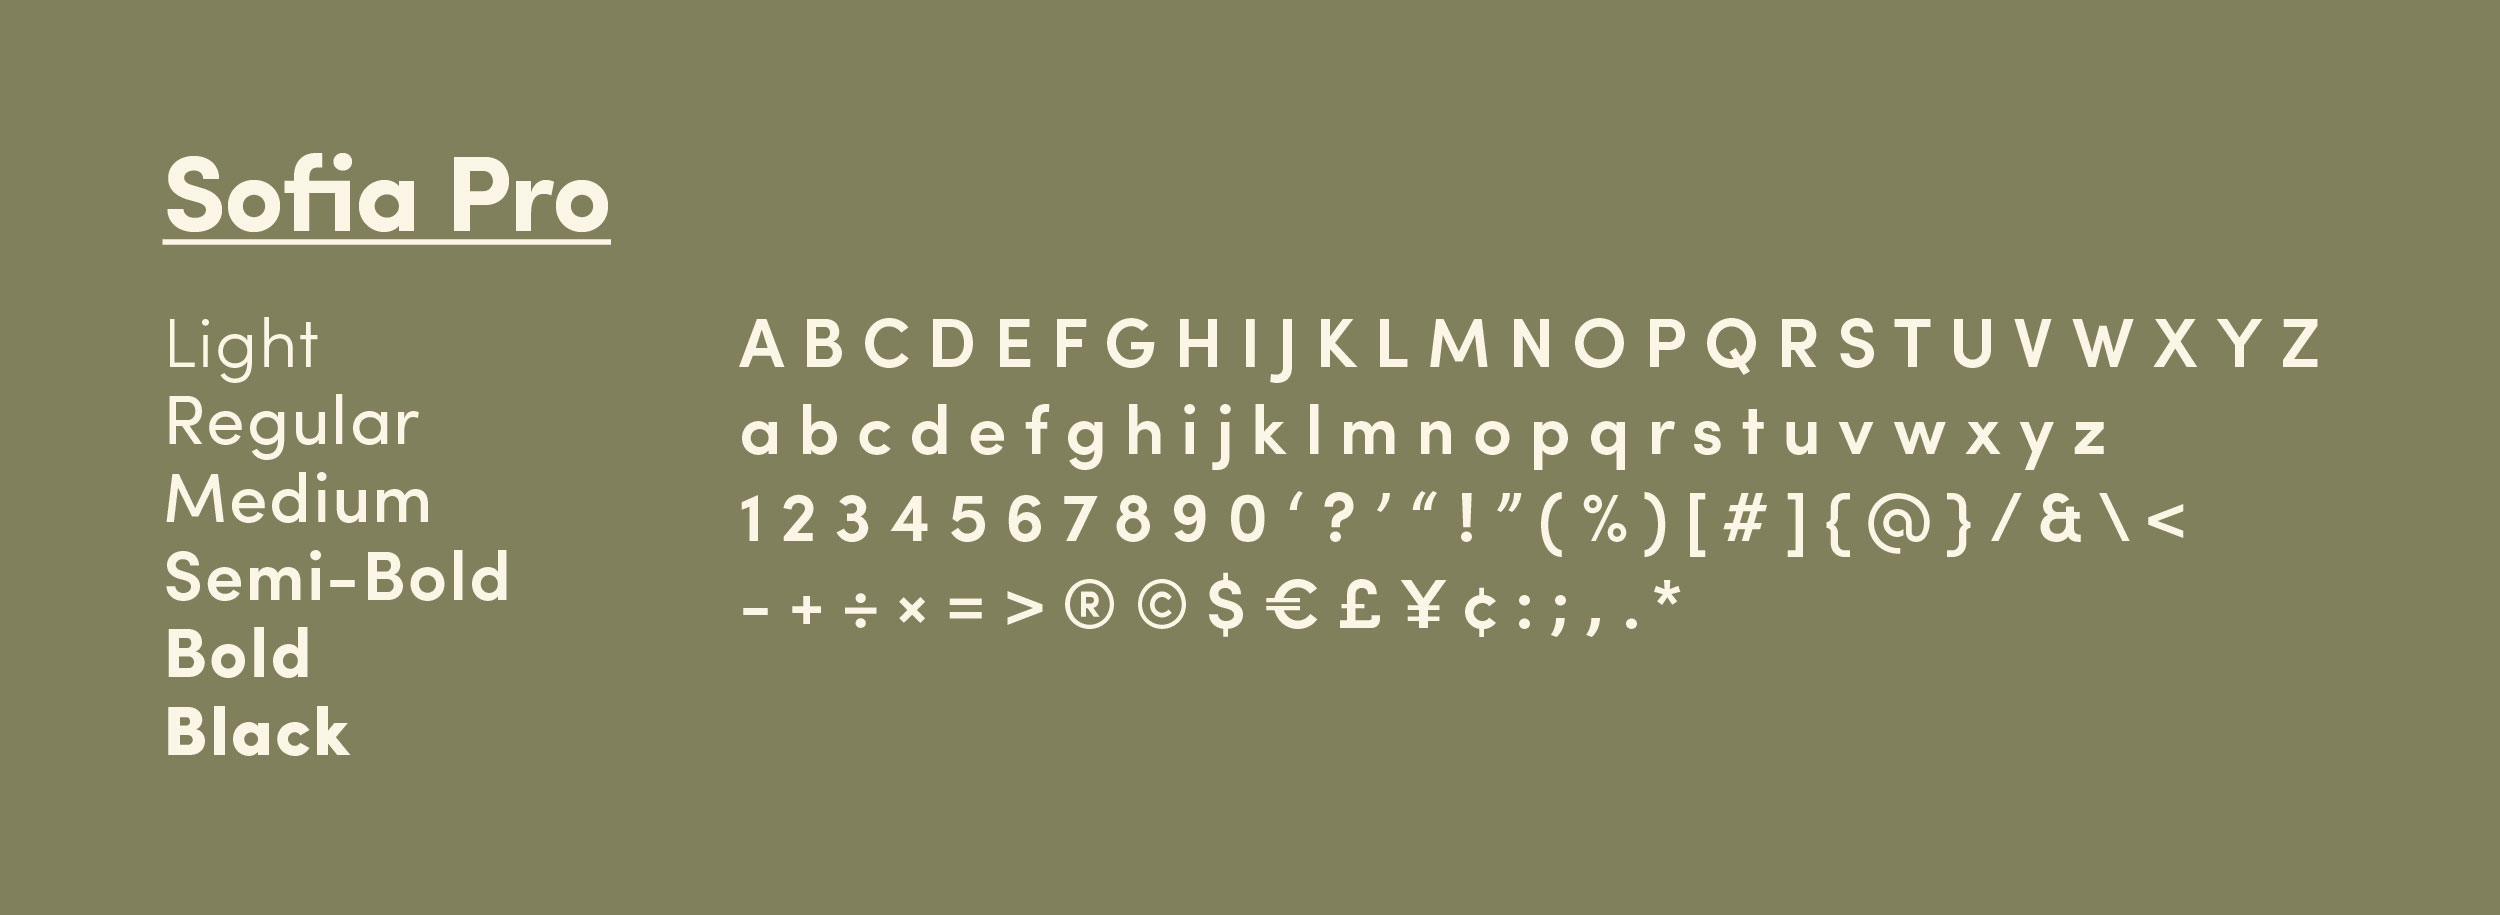 sofia-pro-brand-font.jpg